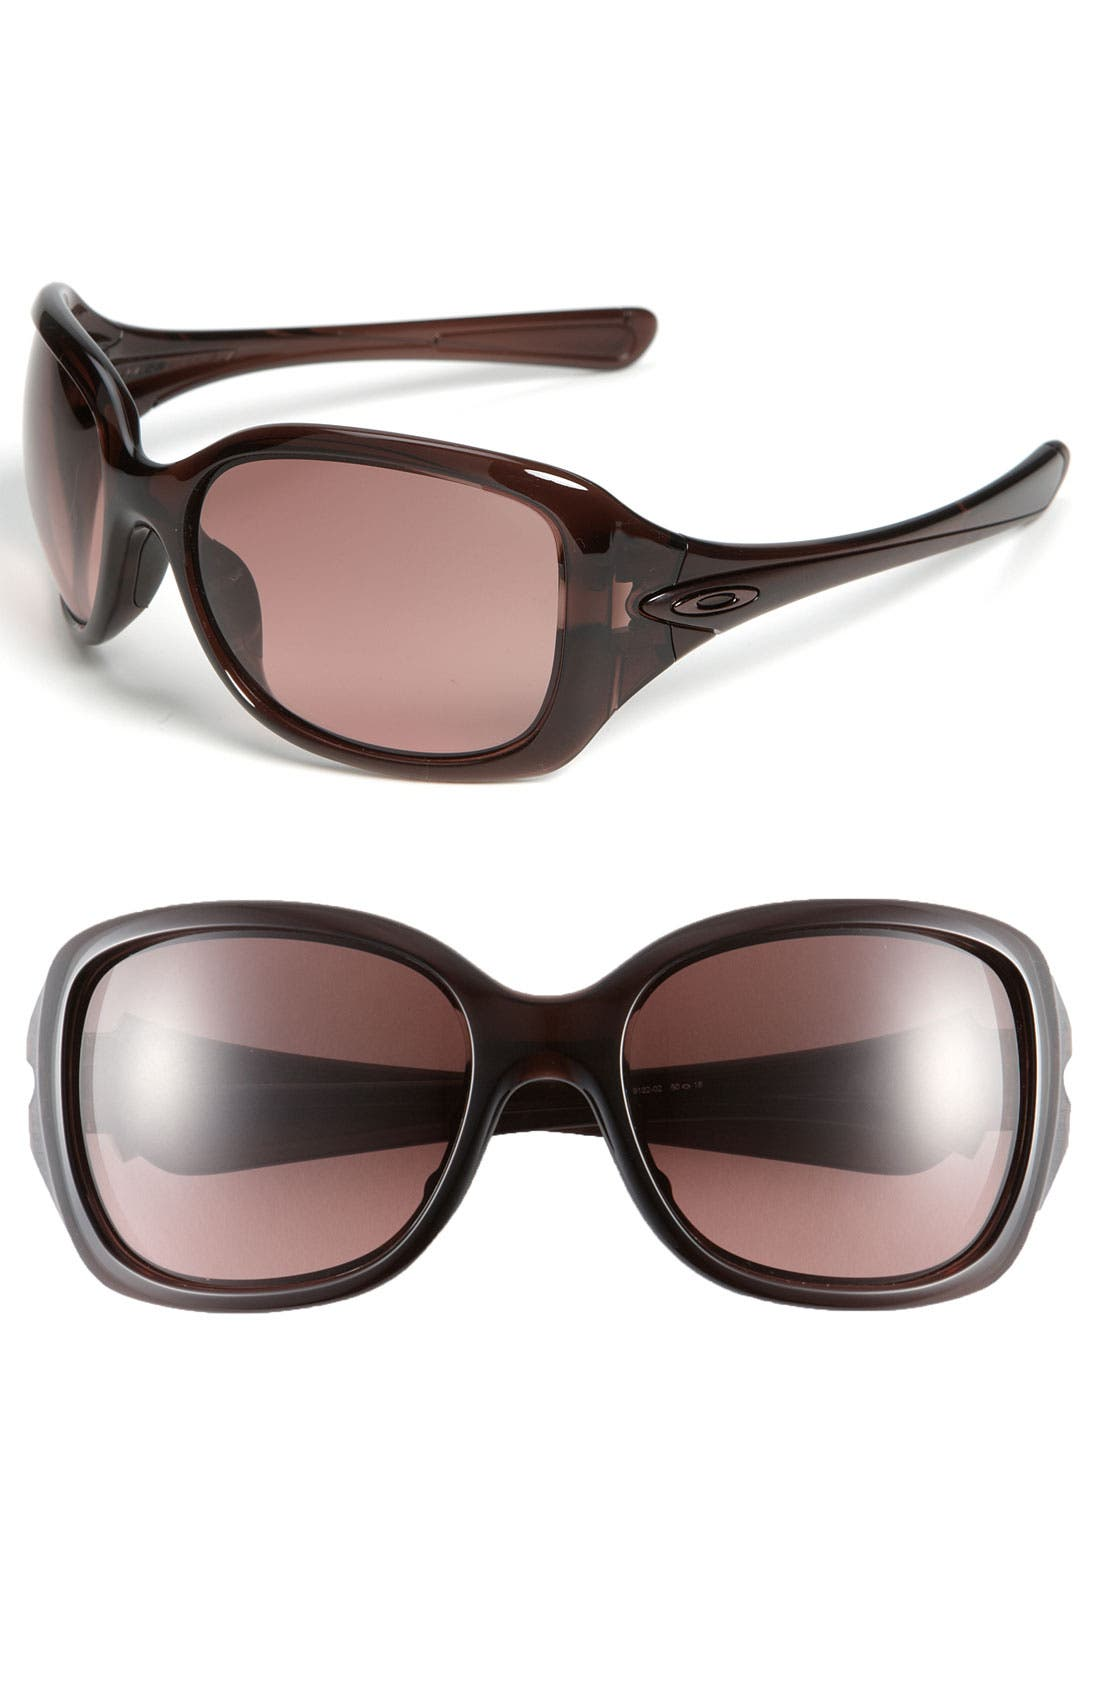 Alternate Image 1 Selected - Oakley 'Necessity™' Sunglasses